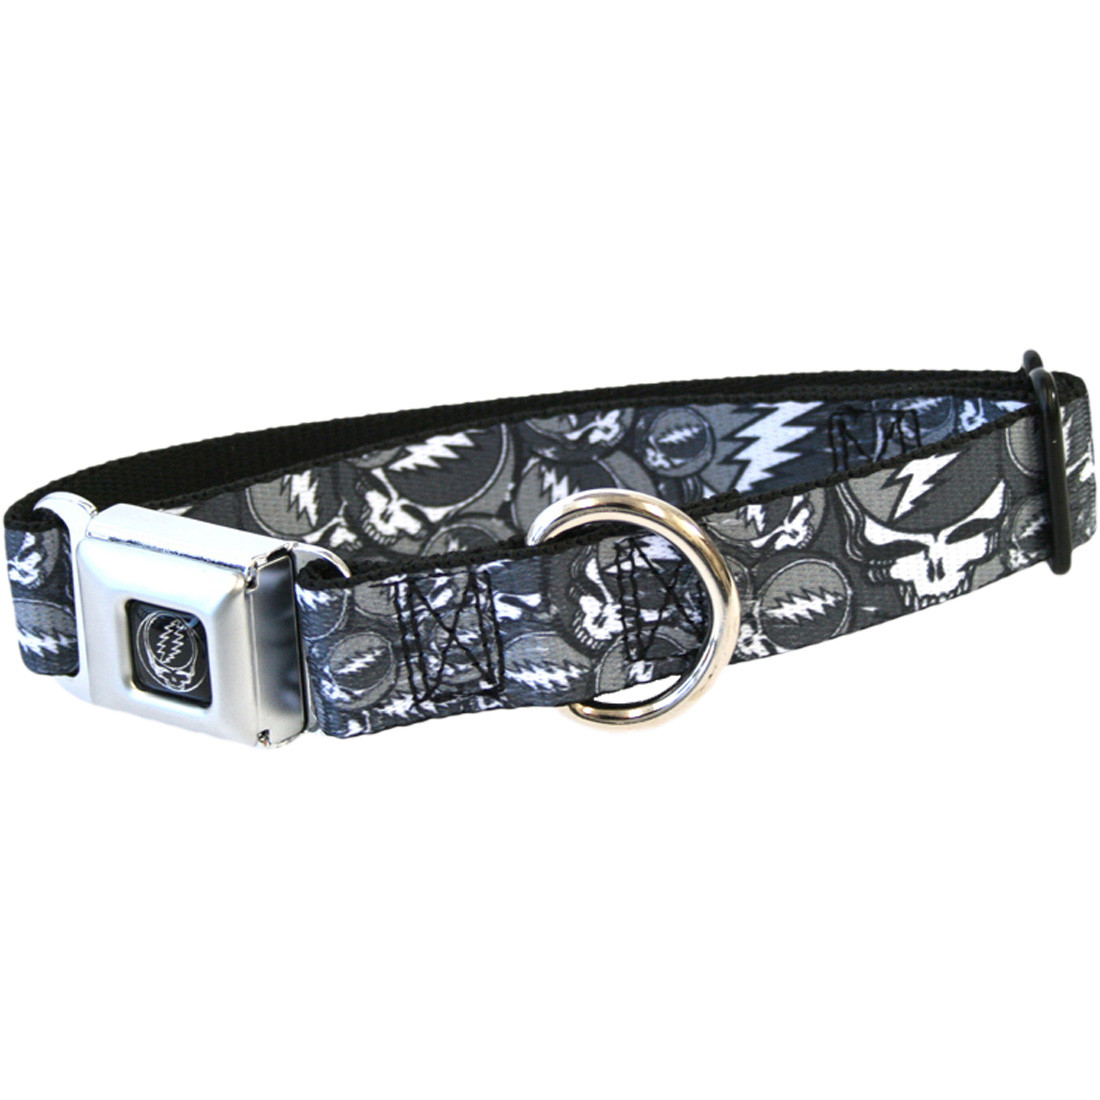 SYF Black And Gray Dog Collar Lg